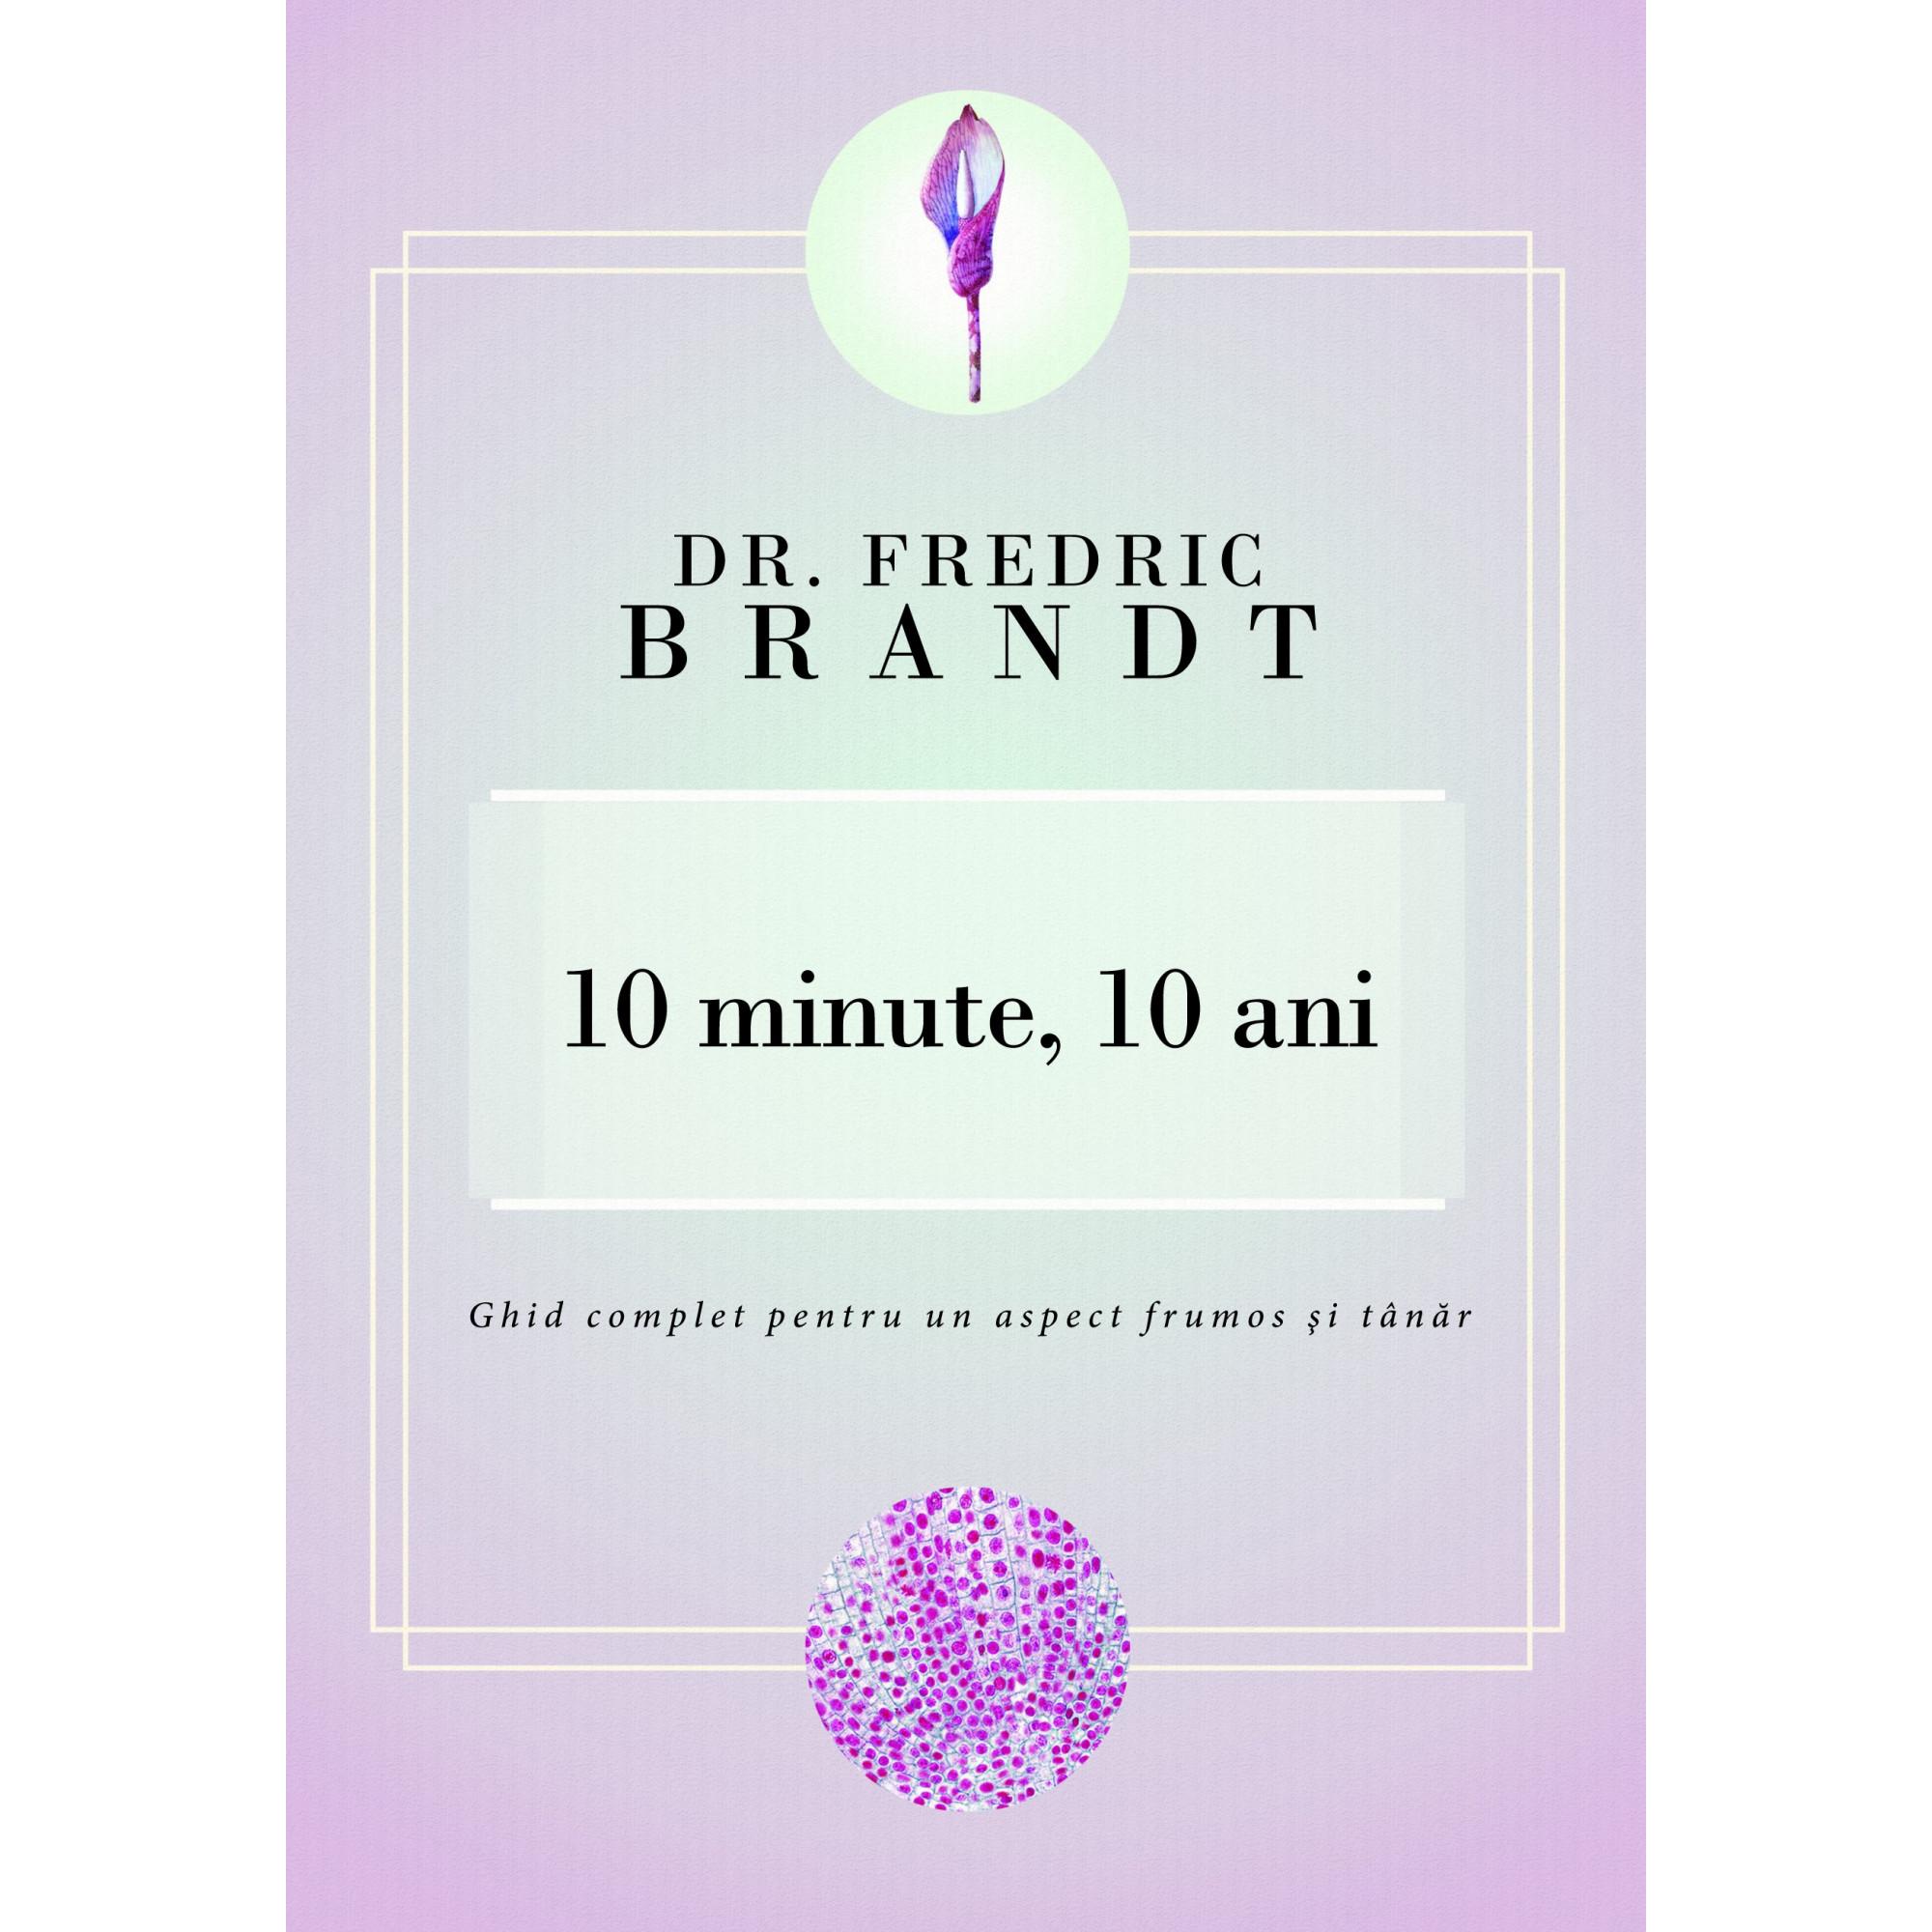 10 minute, 10 ani; Dr. Fredric Brandt